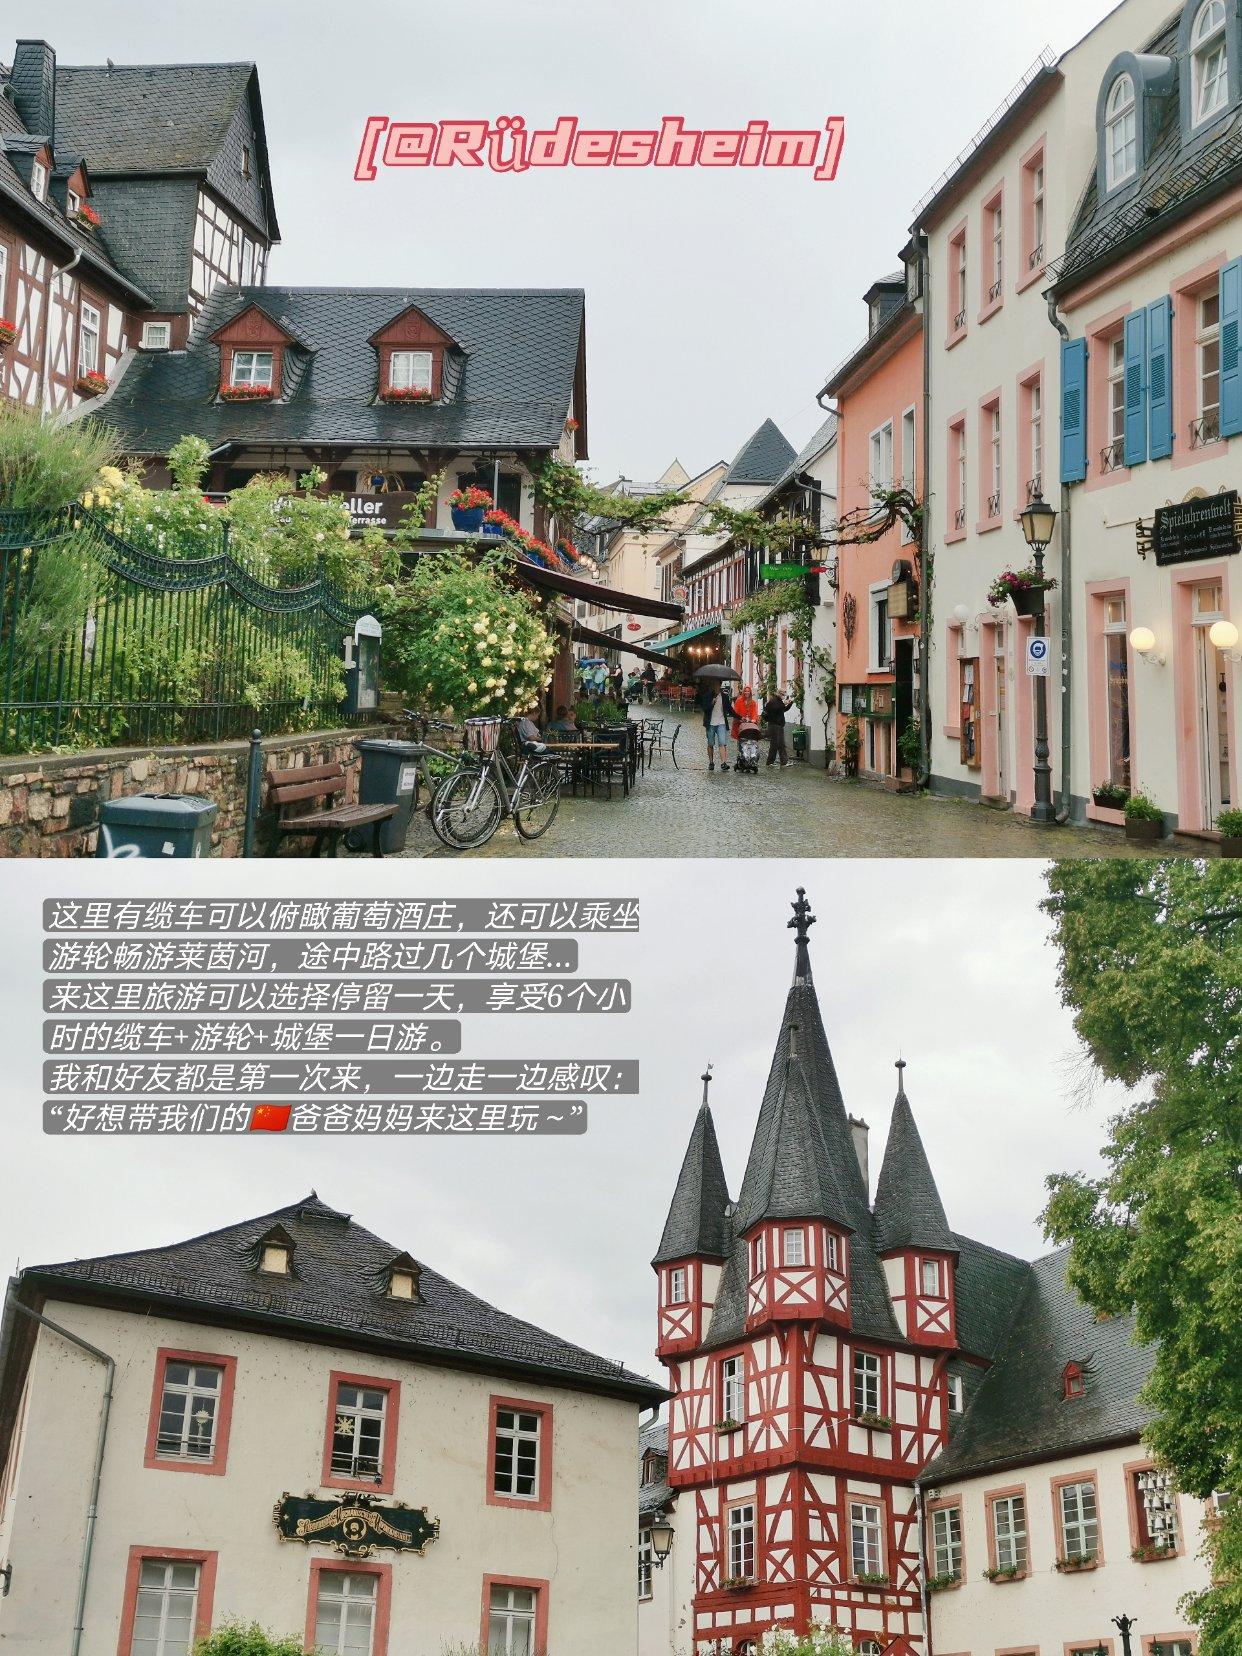 2021年6月1-7日,🇩🇪法兰克福(下)。